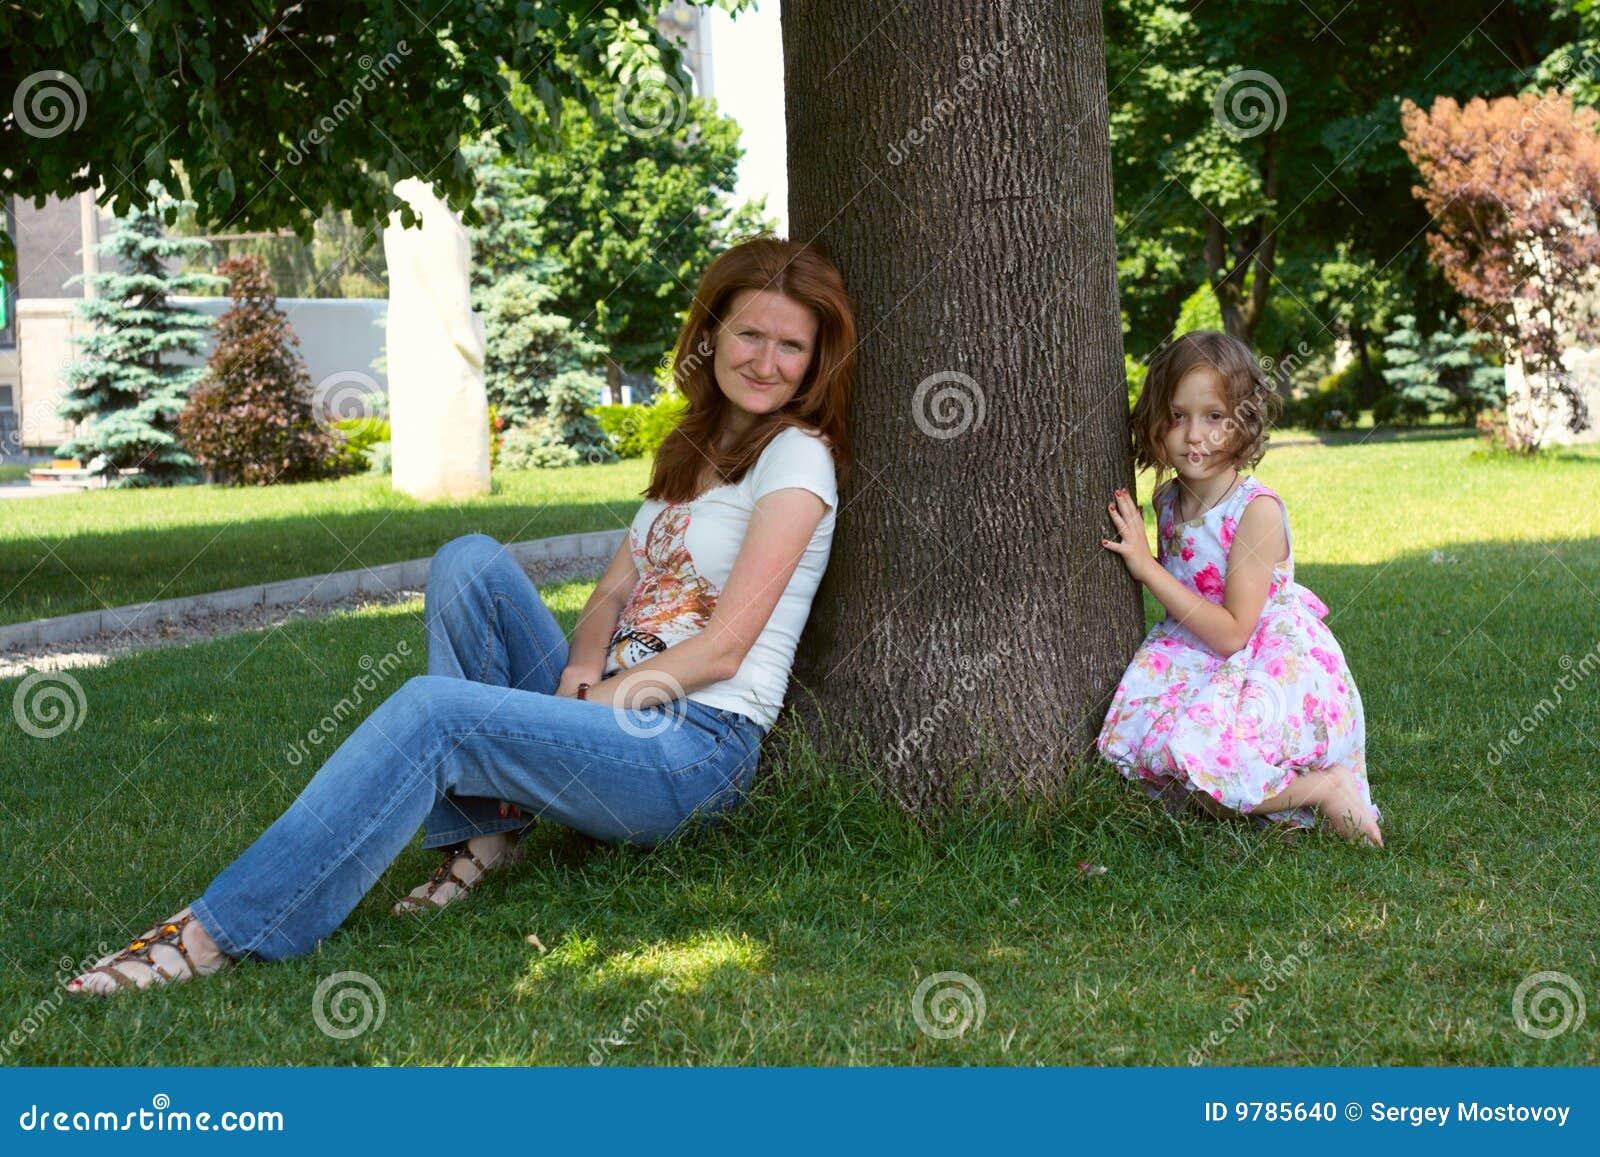 Under the shade of tree